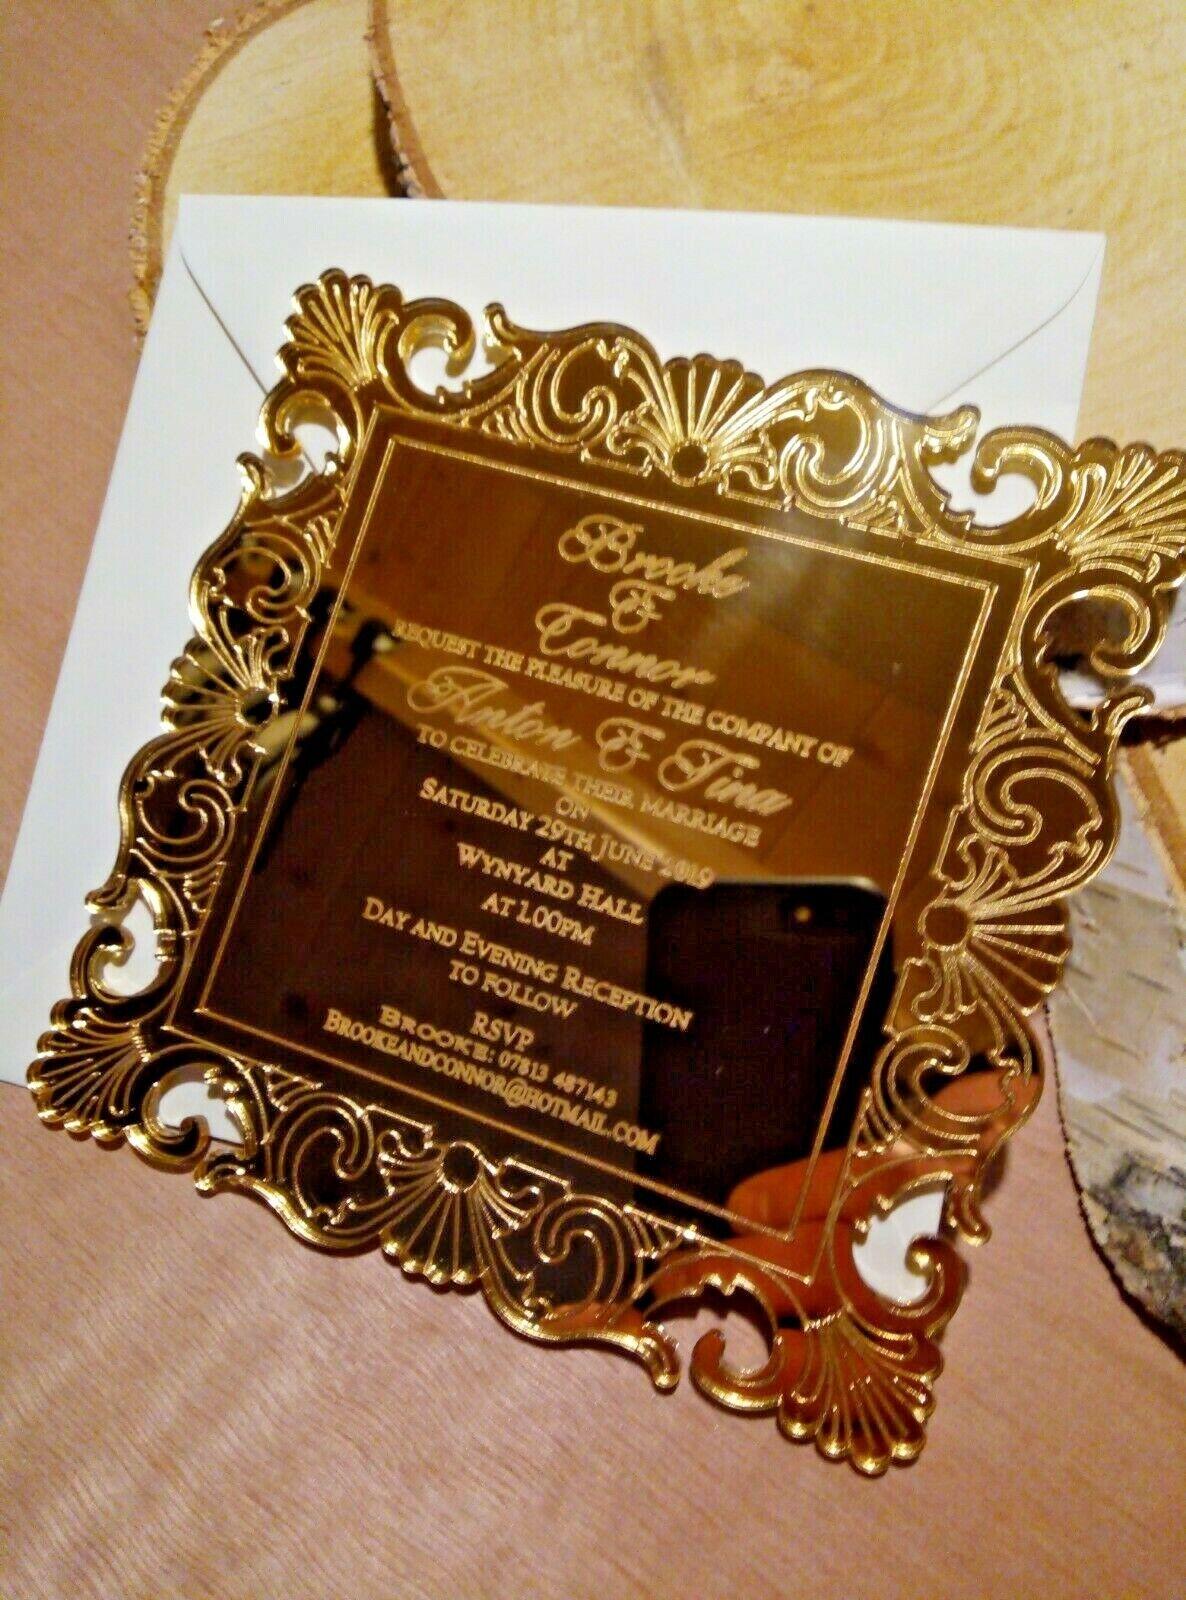 50 Luxe Miroir D'or Mariage Invitations Avec Enveloppes